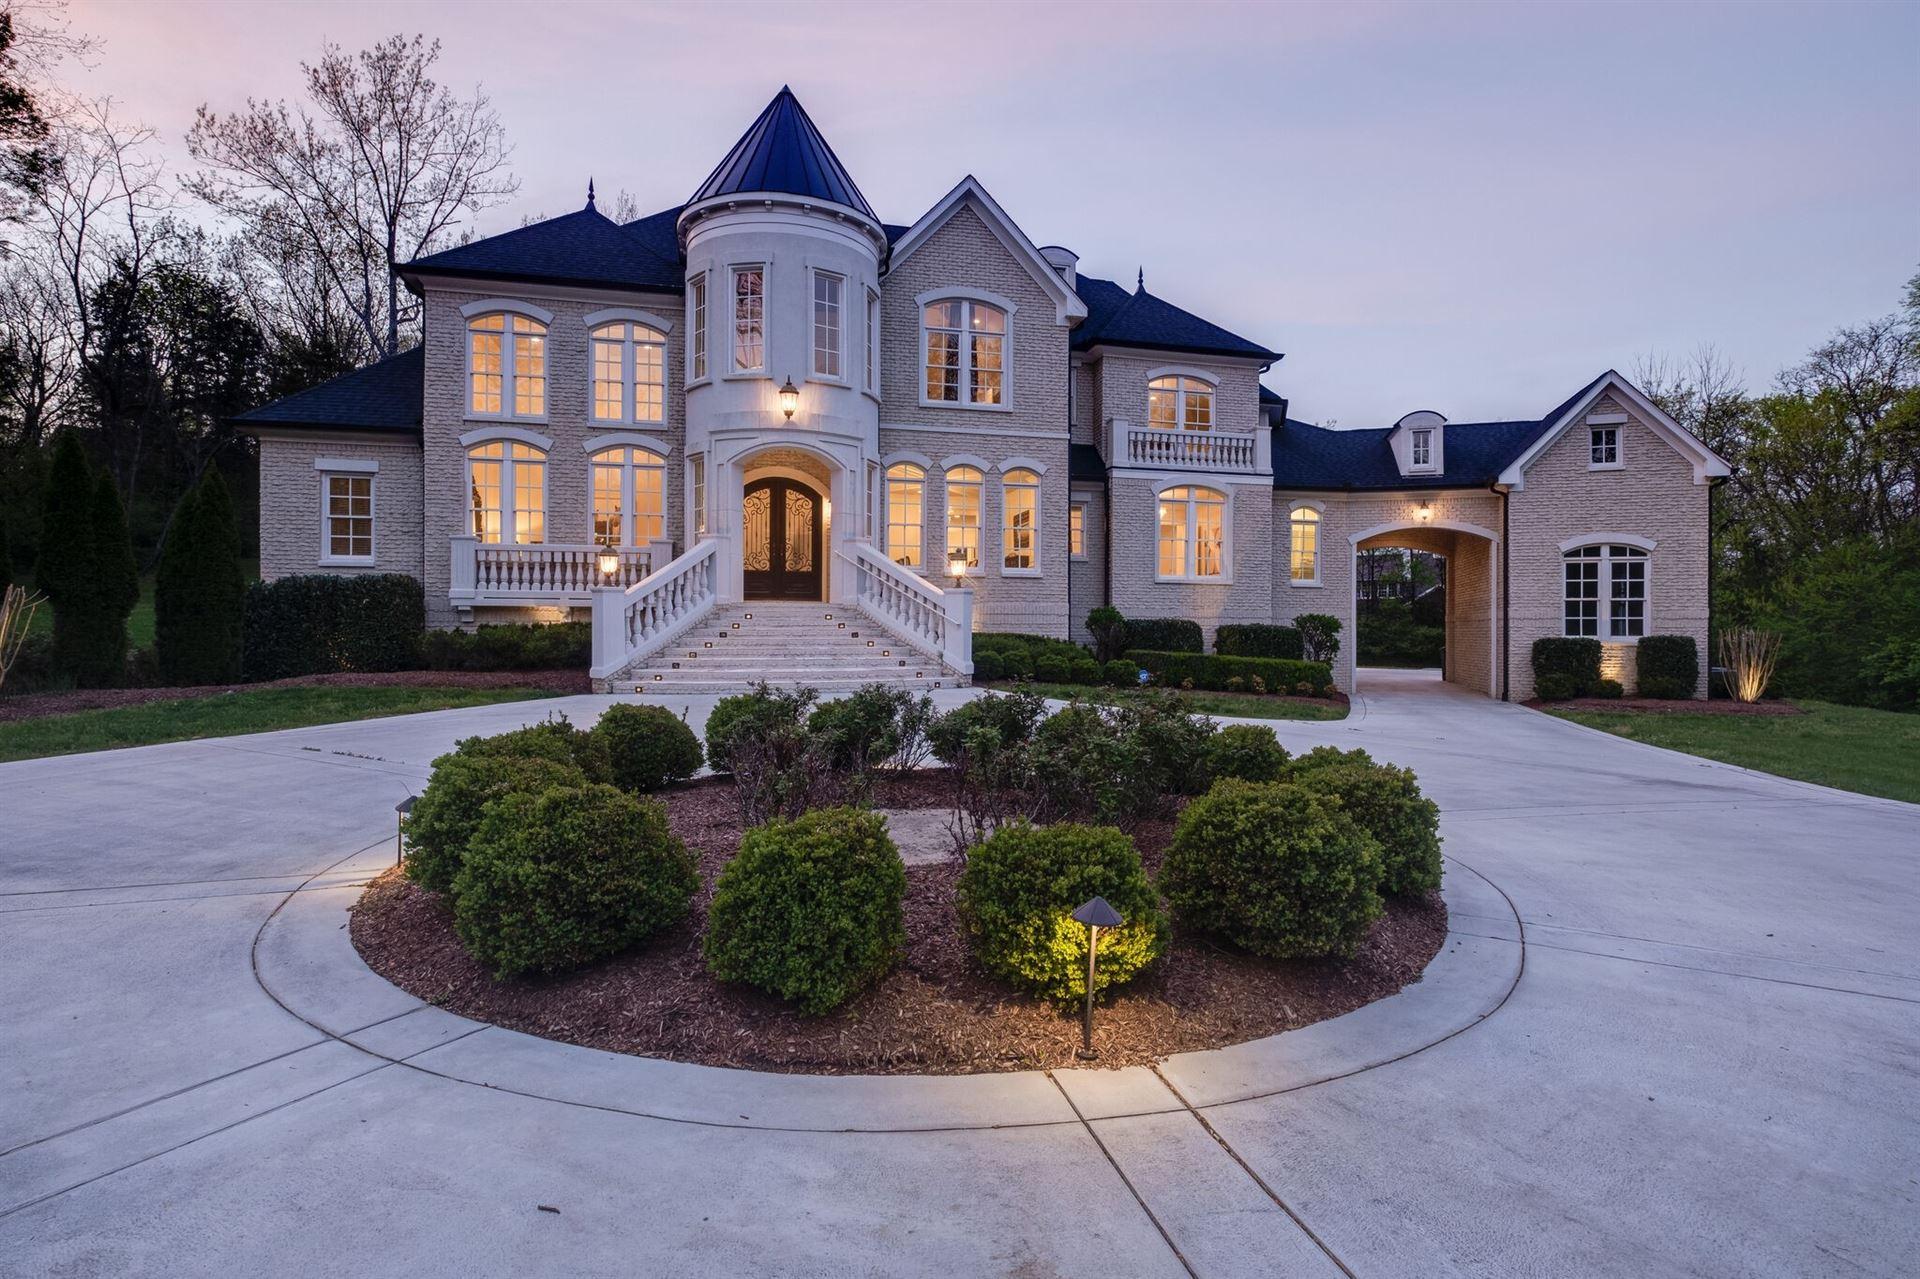 1813 Pace Hvn, Franklin, TN 37069 - MLS#: 2296518